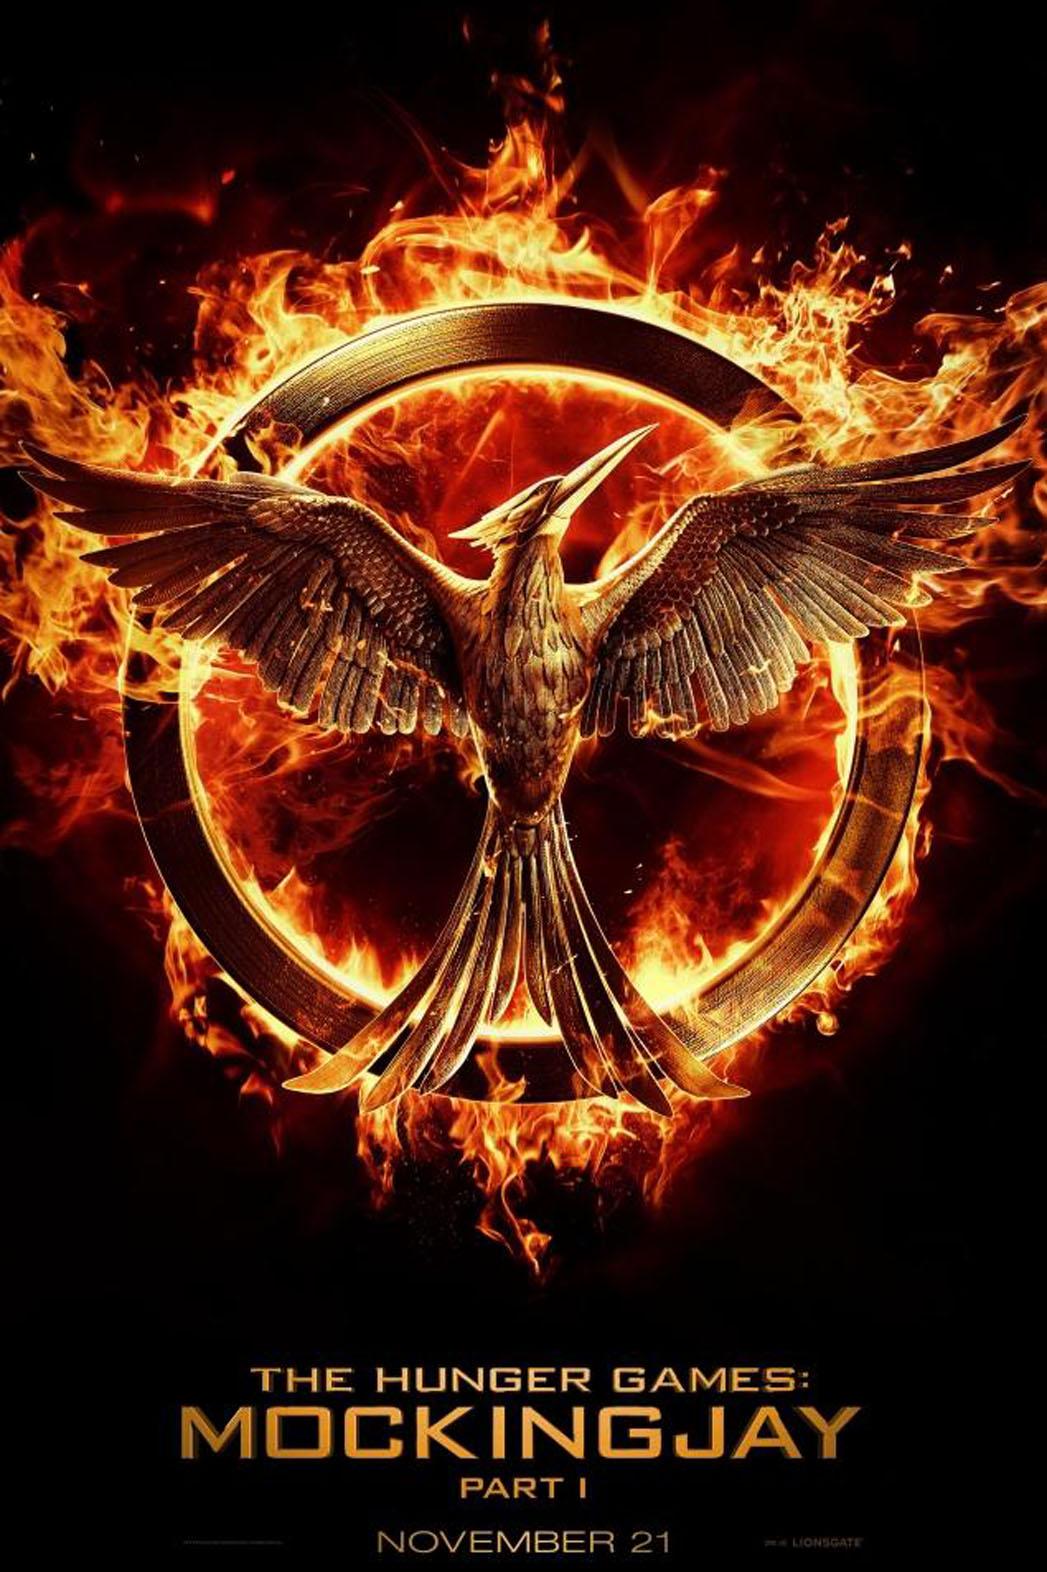 Hunger Games Mocking Jay Poster - P 2014